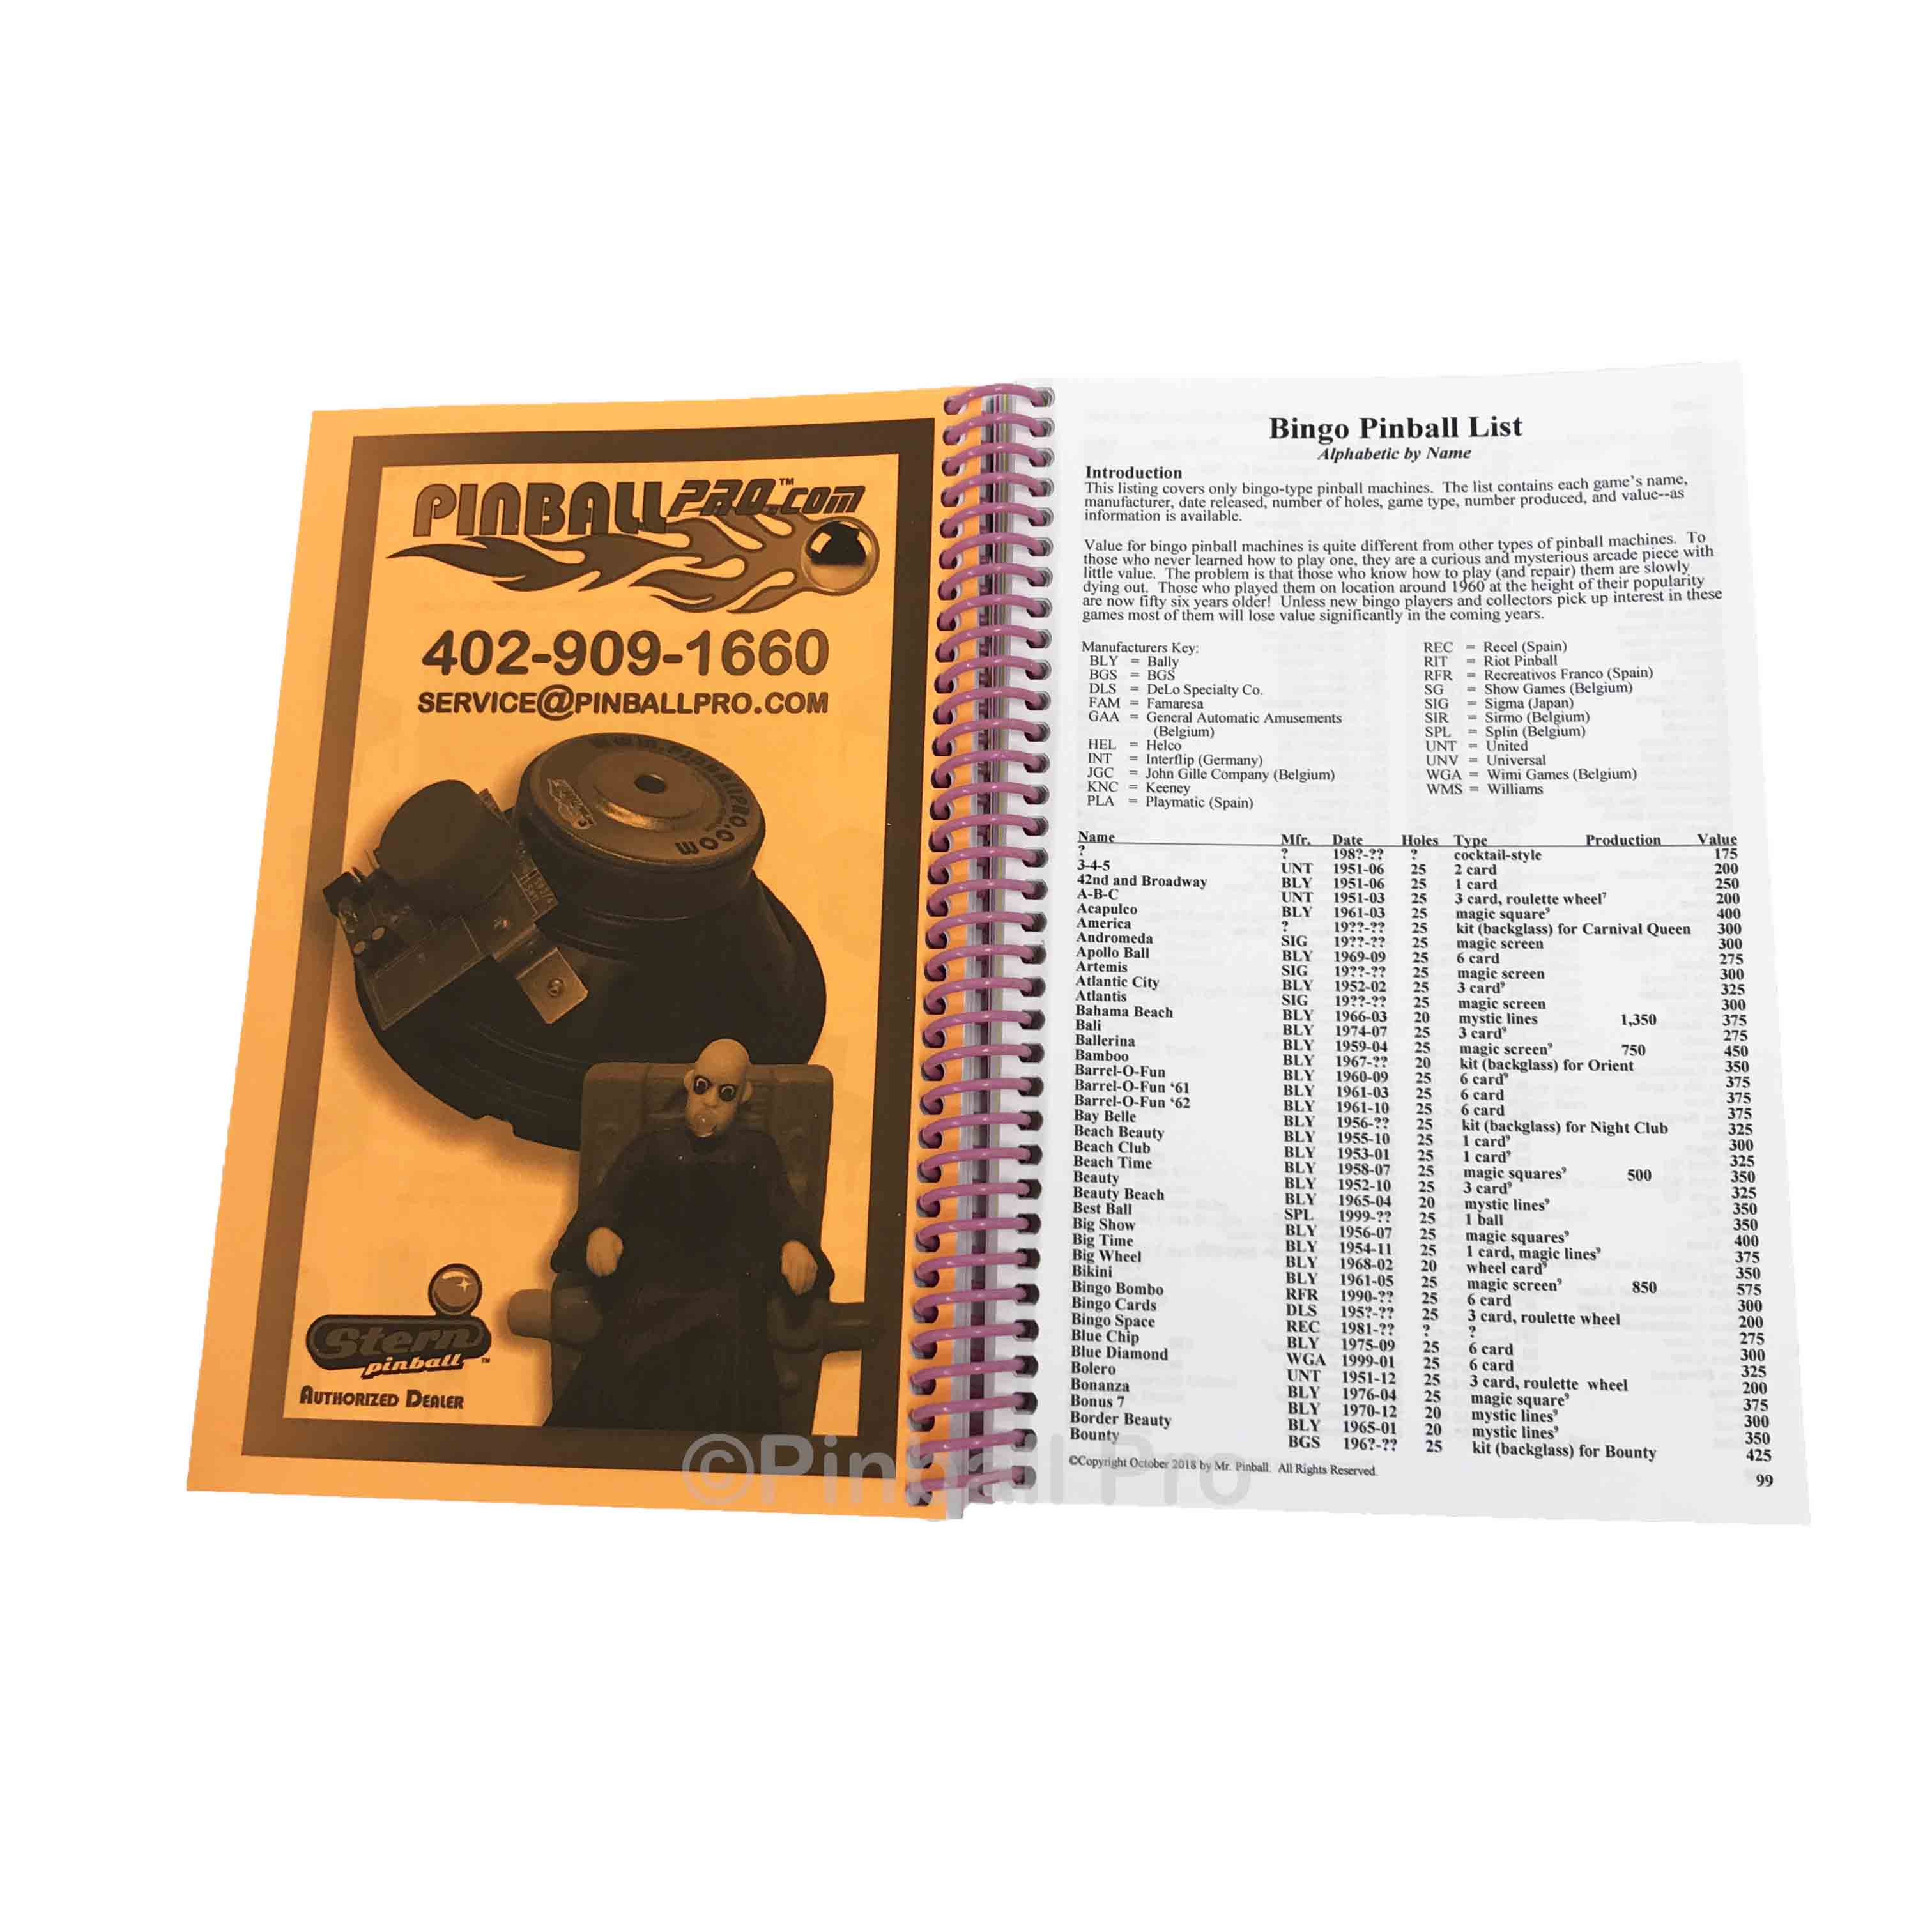 13 Manuals and references (Pinball)